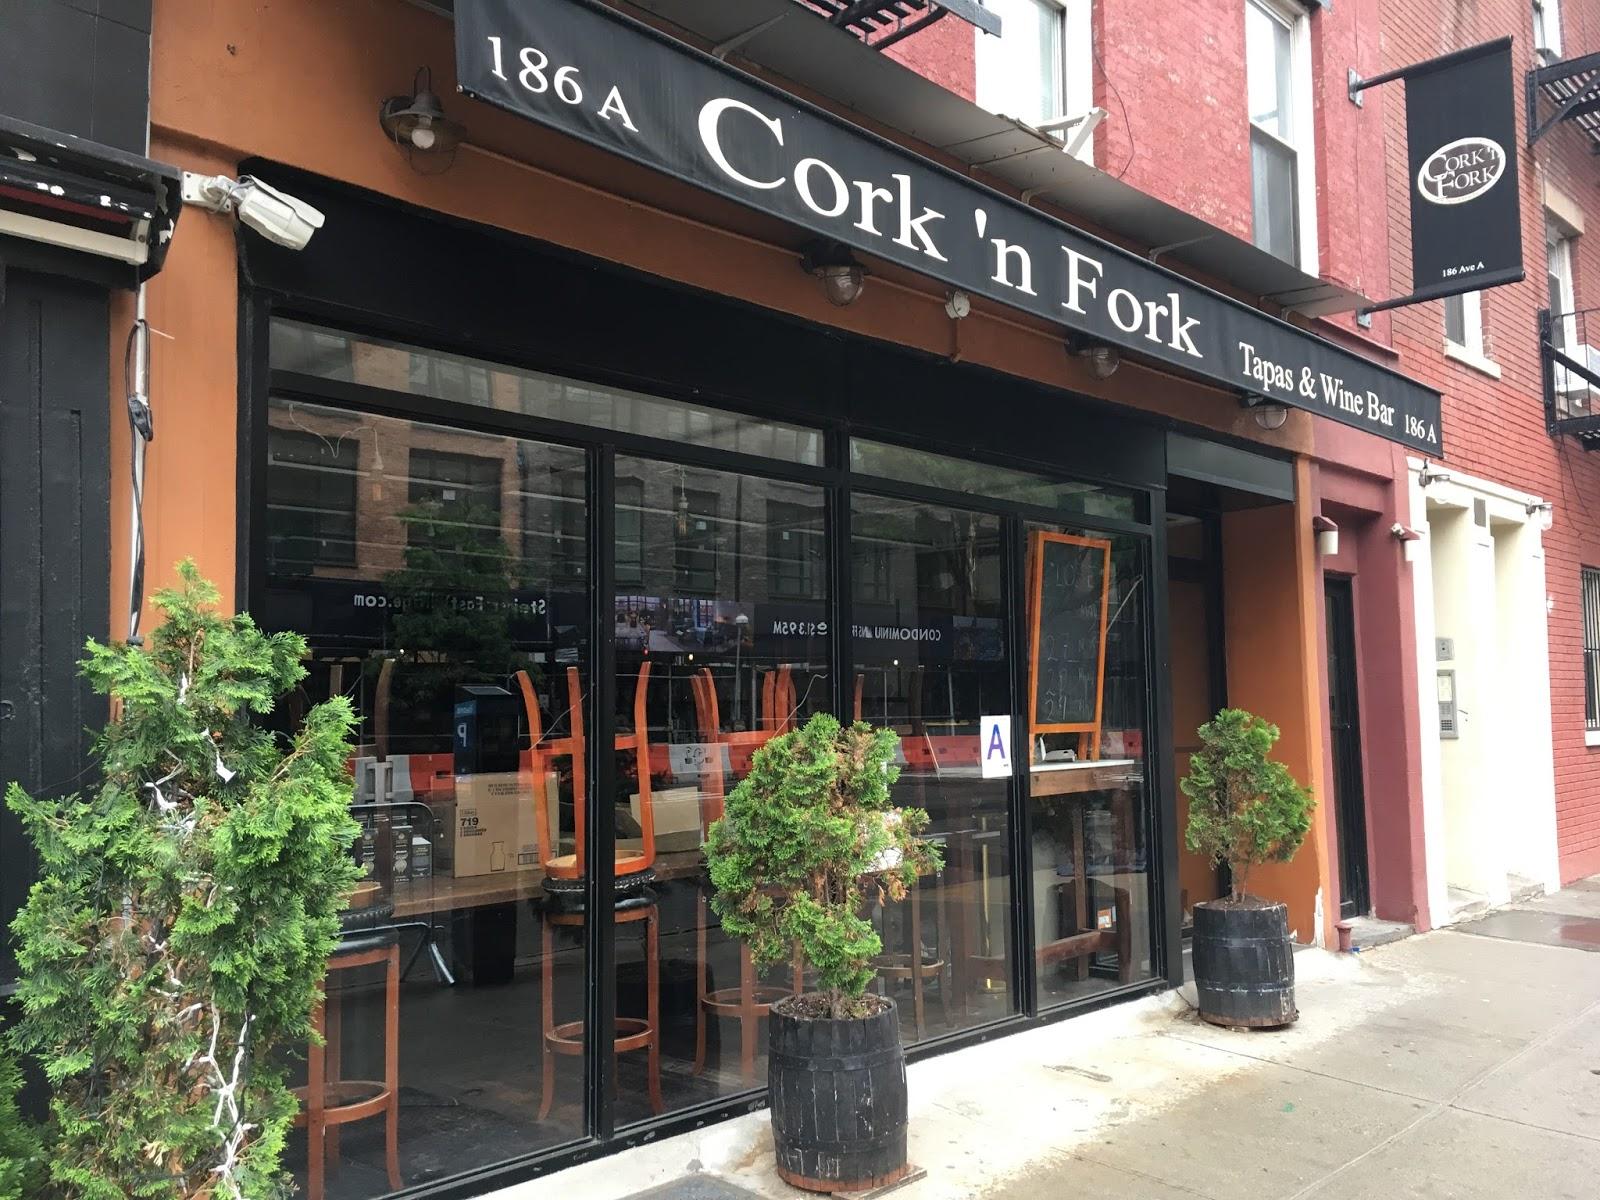 ev grieve: cork 'n fork is now gomi on avenue a